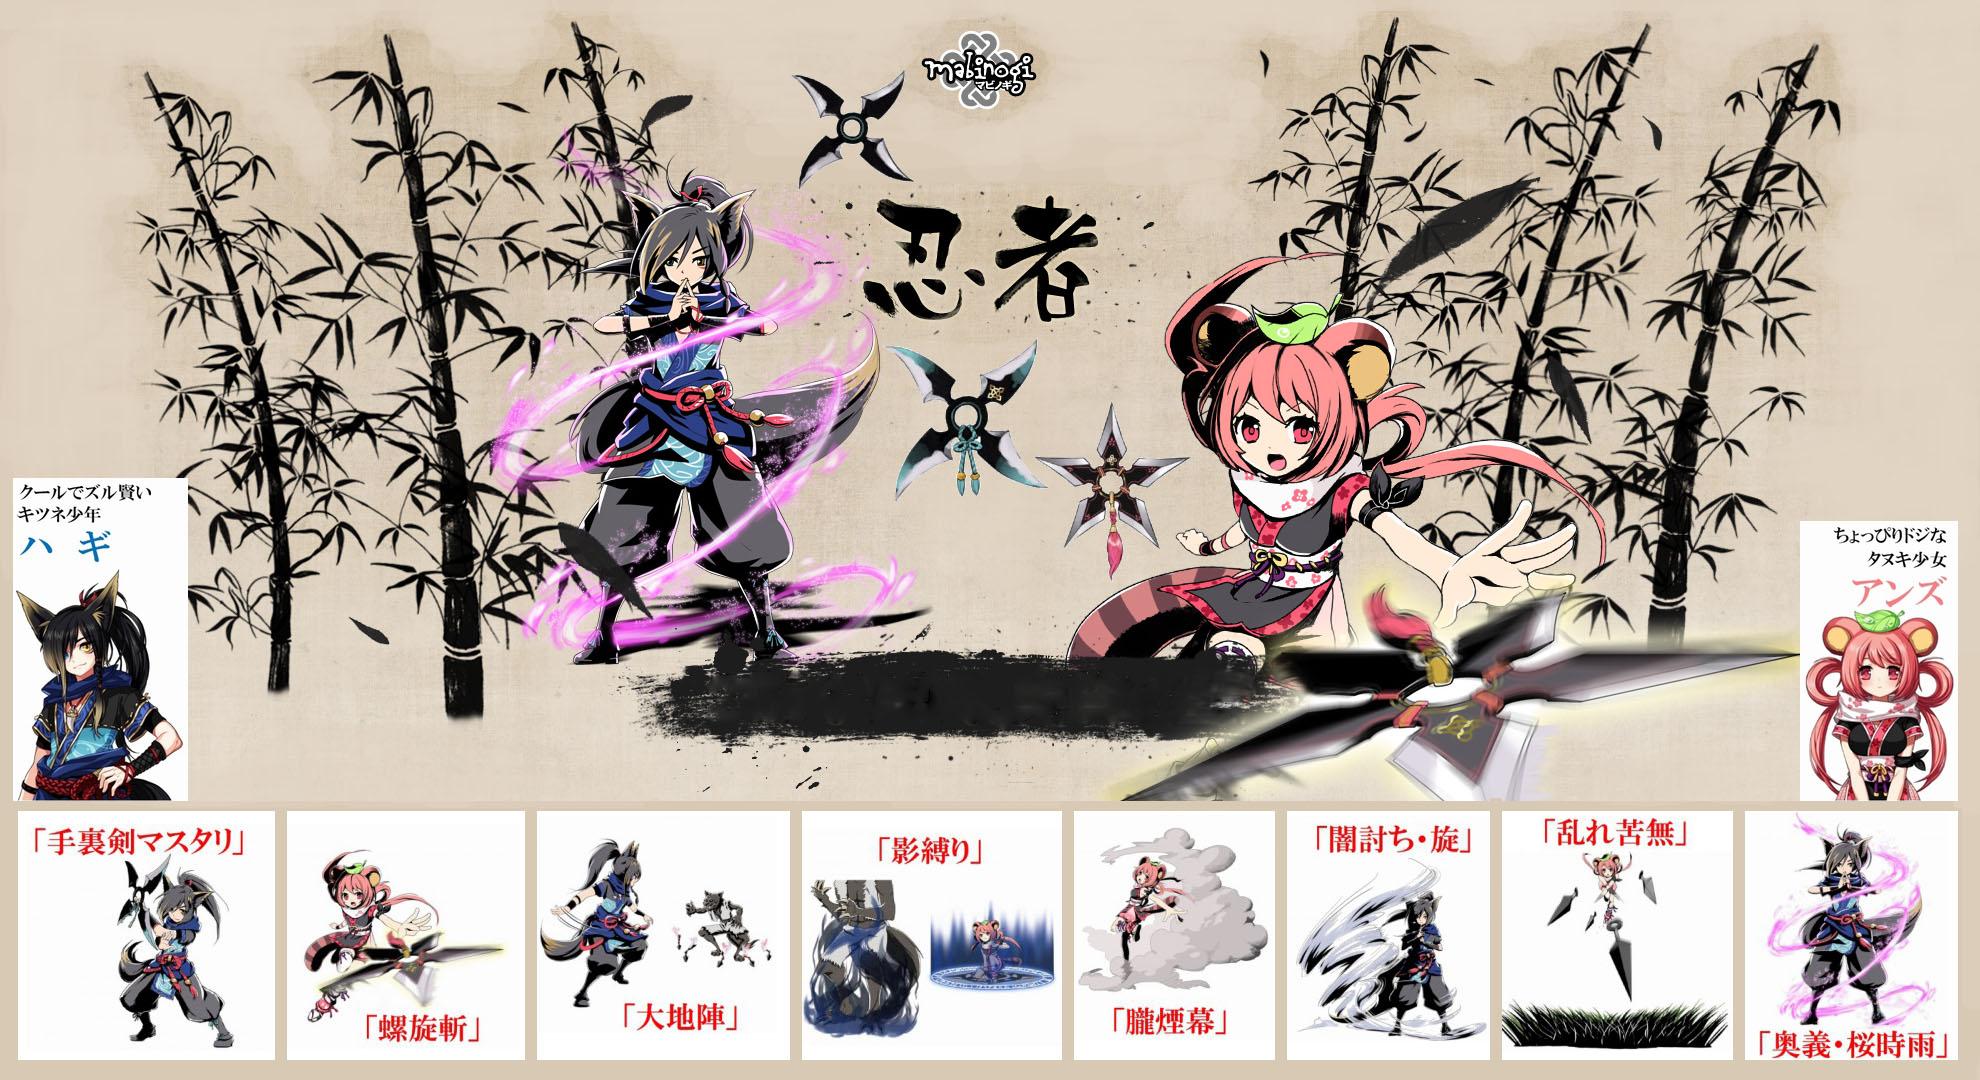 Mabinogi_Ninja_wallpaper1980x1080